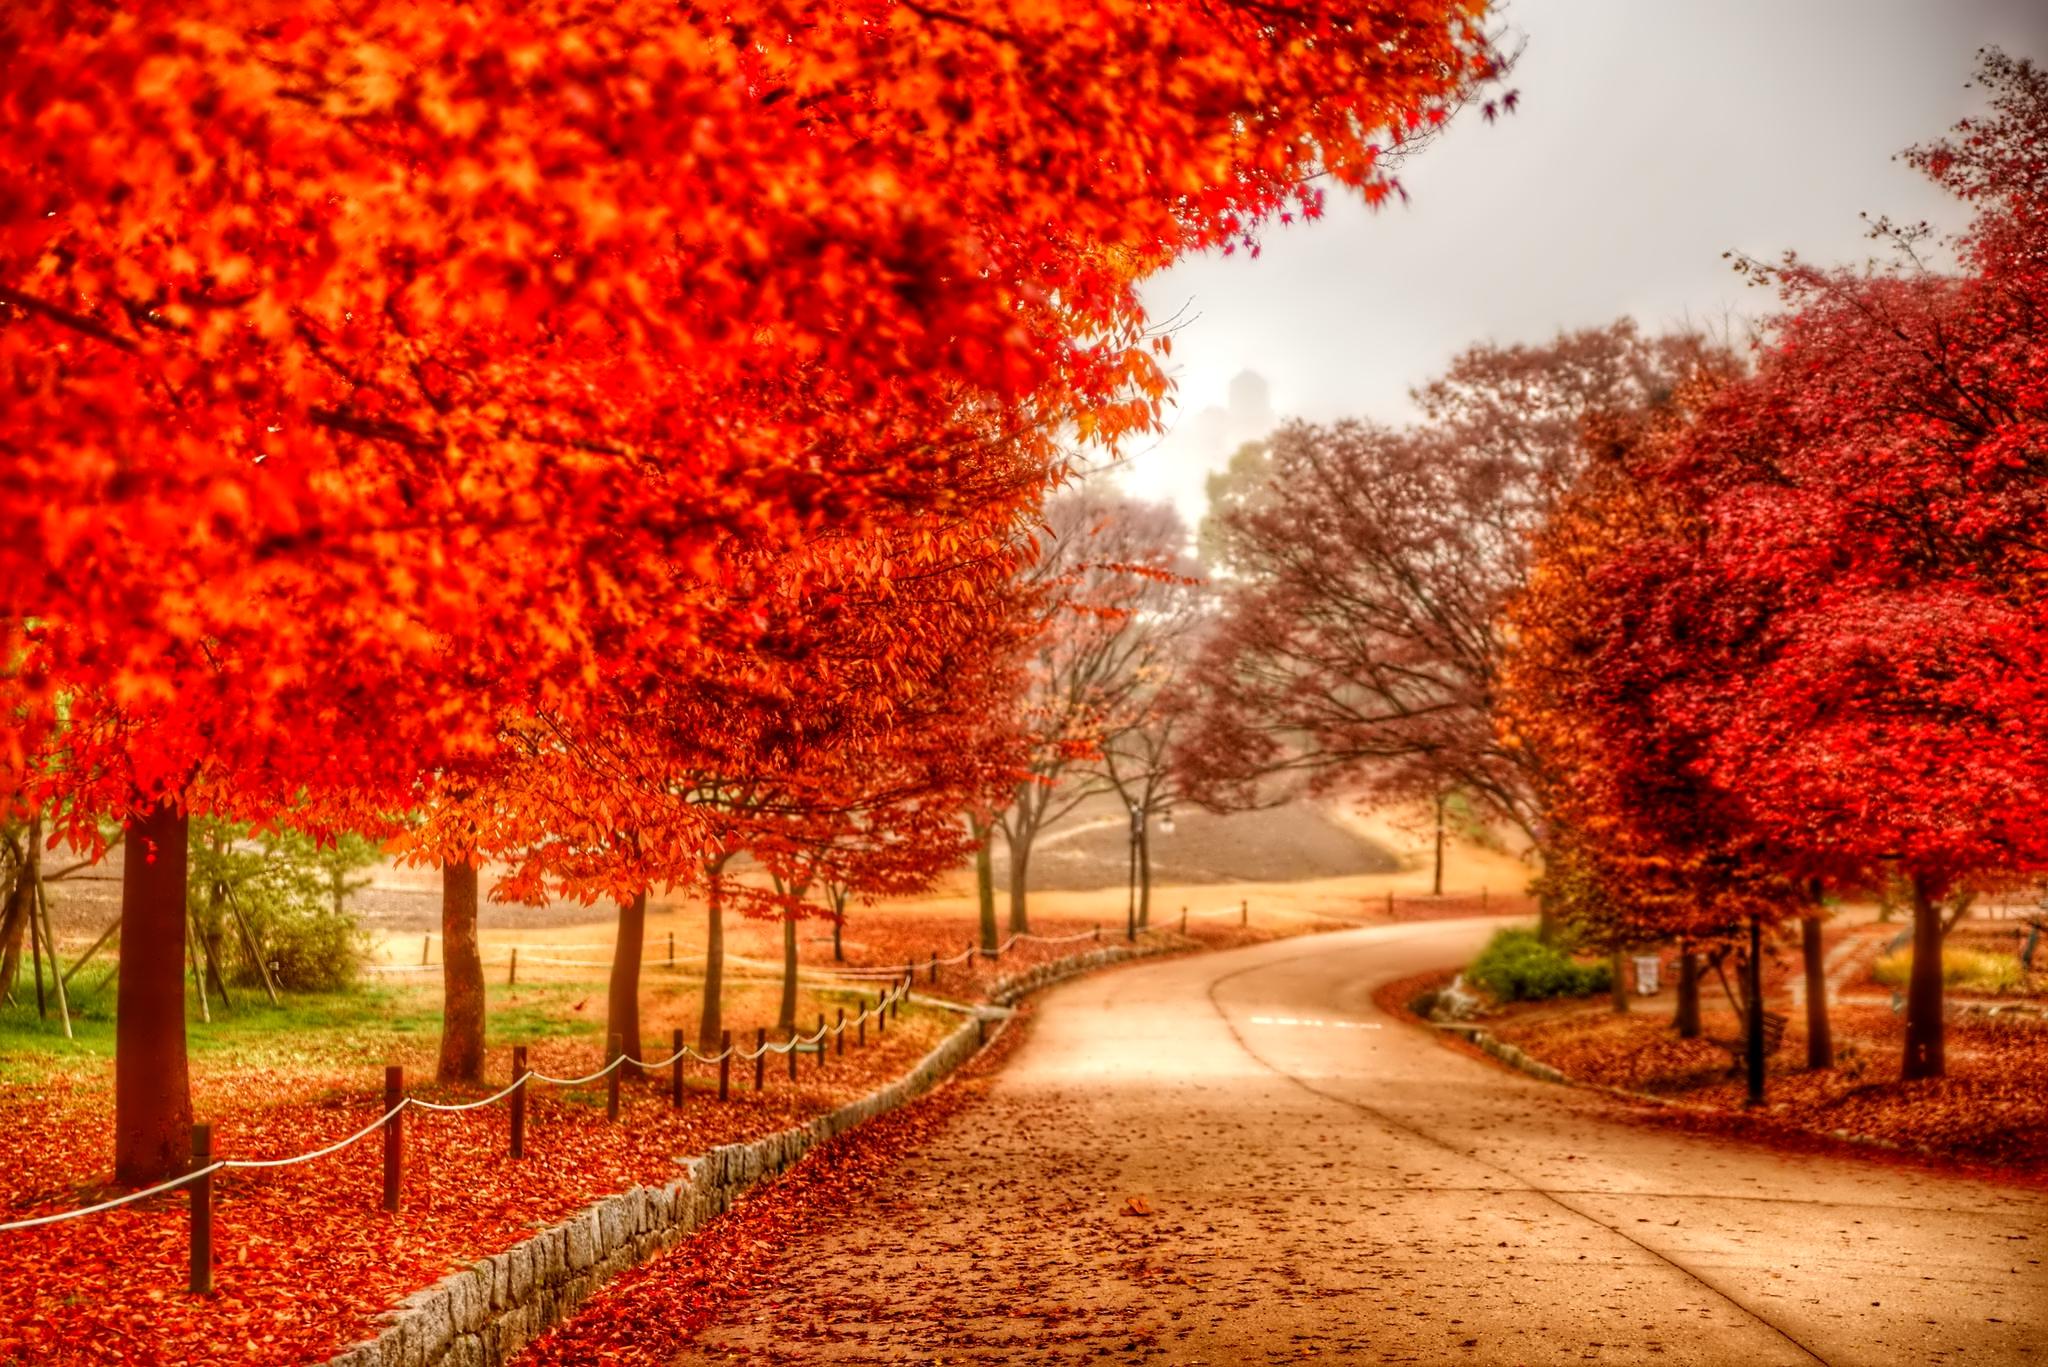 november_foliage_trees_reflection_nature_1024x600_hd-wallpaper-1617534